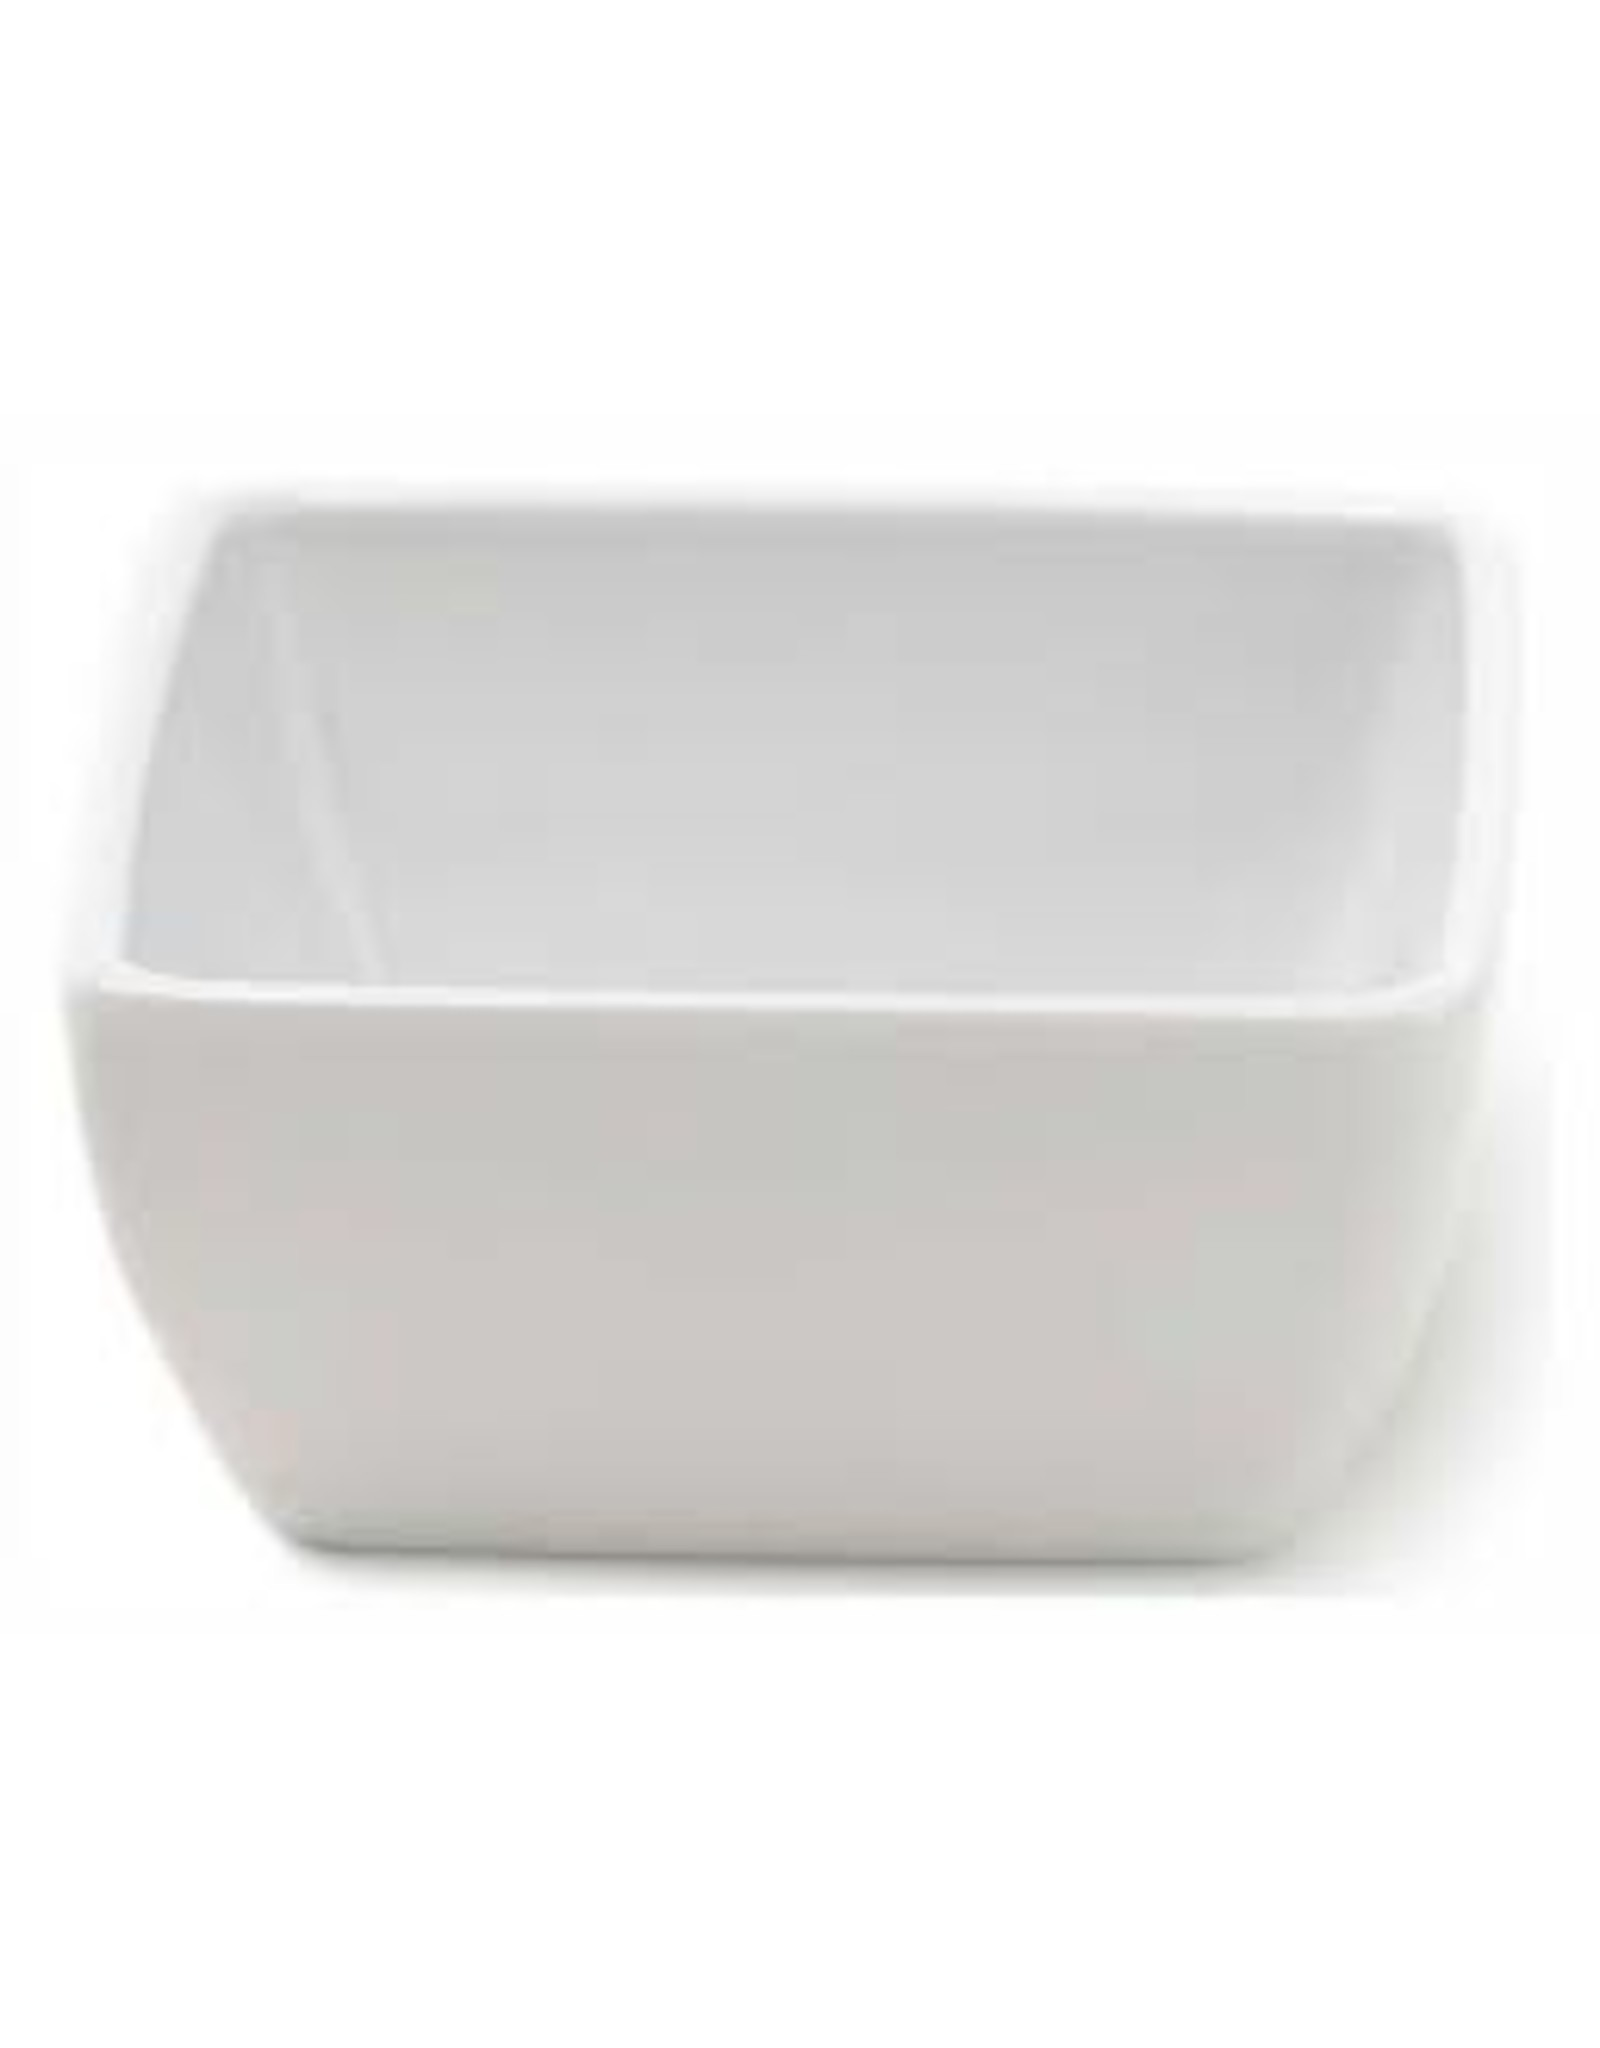 "Q-Squared QSQ Diamond 5"" Square Cereal Bowl"